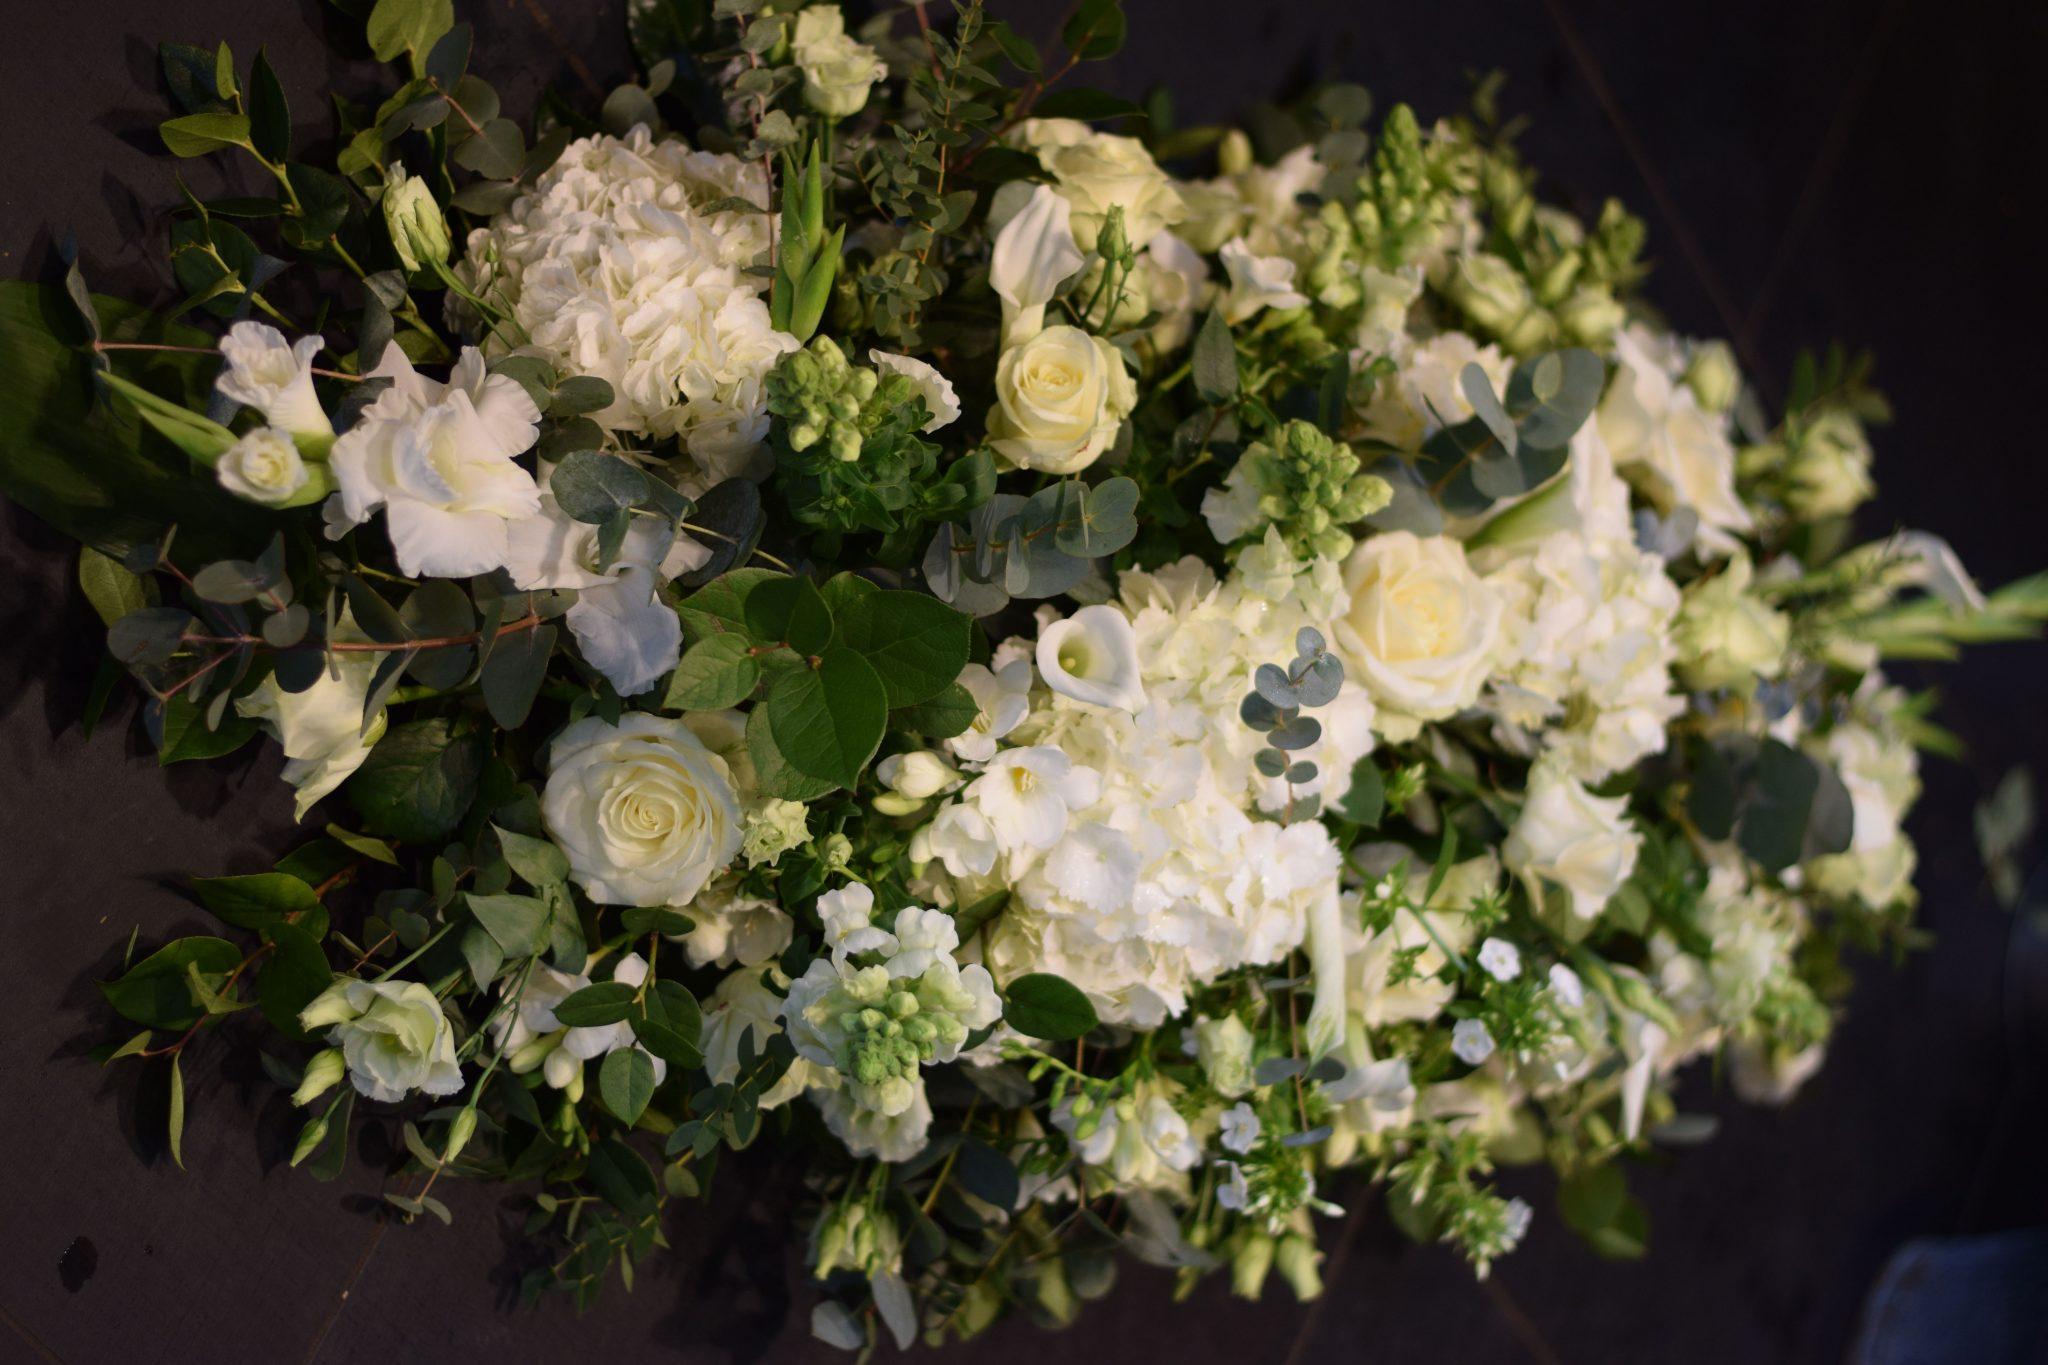 Funeral Flowers Spray Arrangement Kensington Flowers